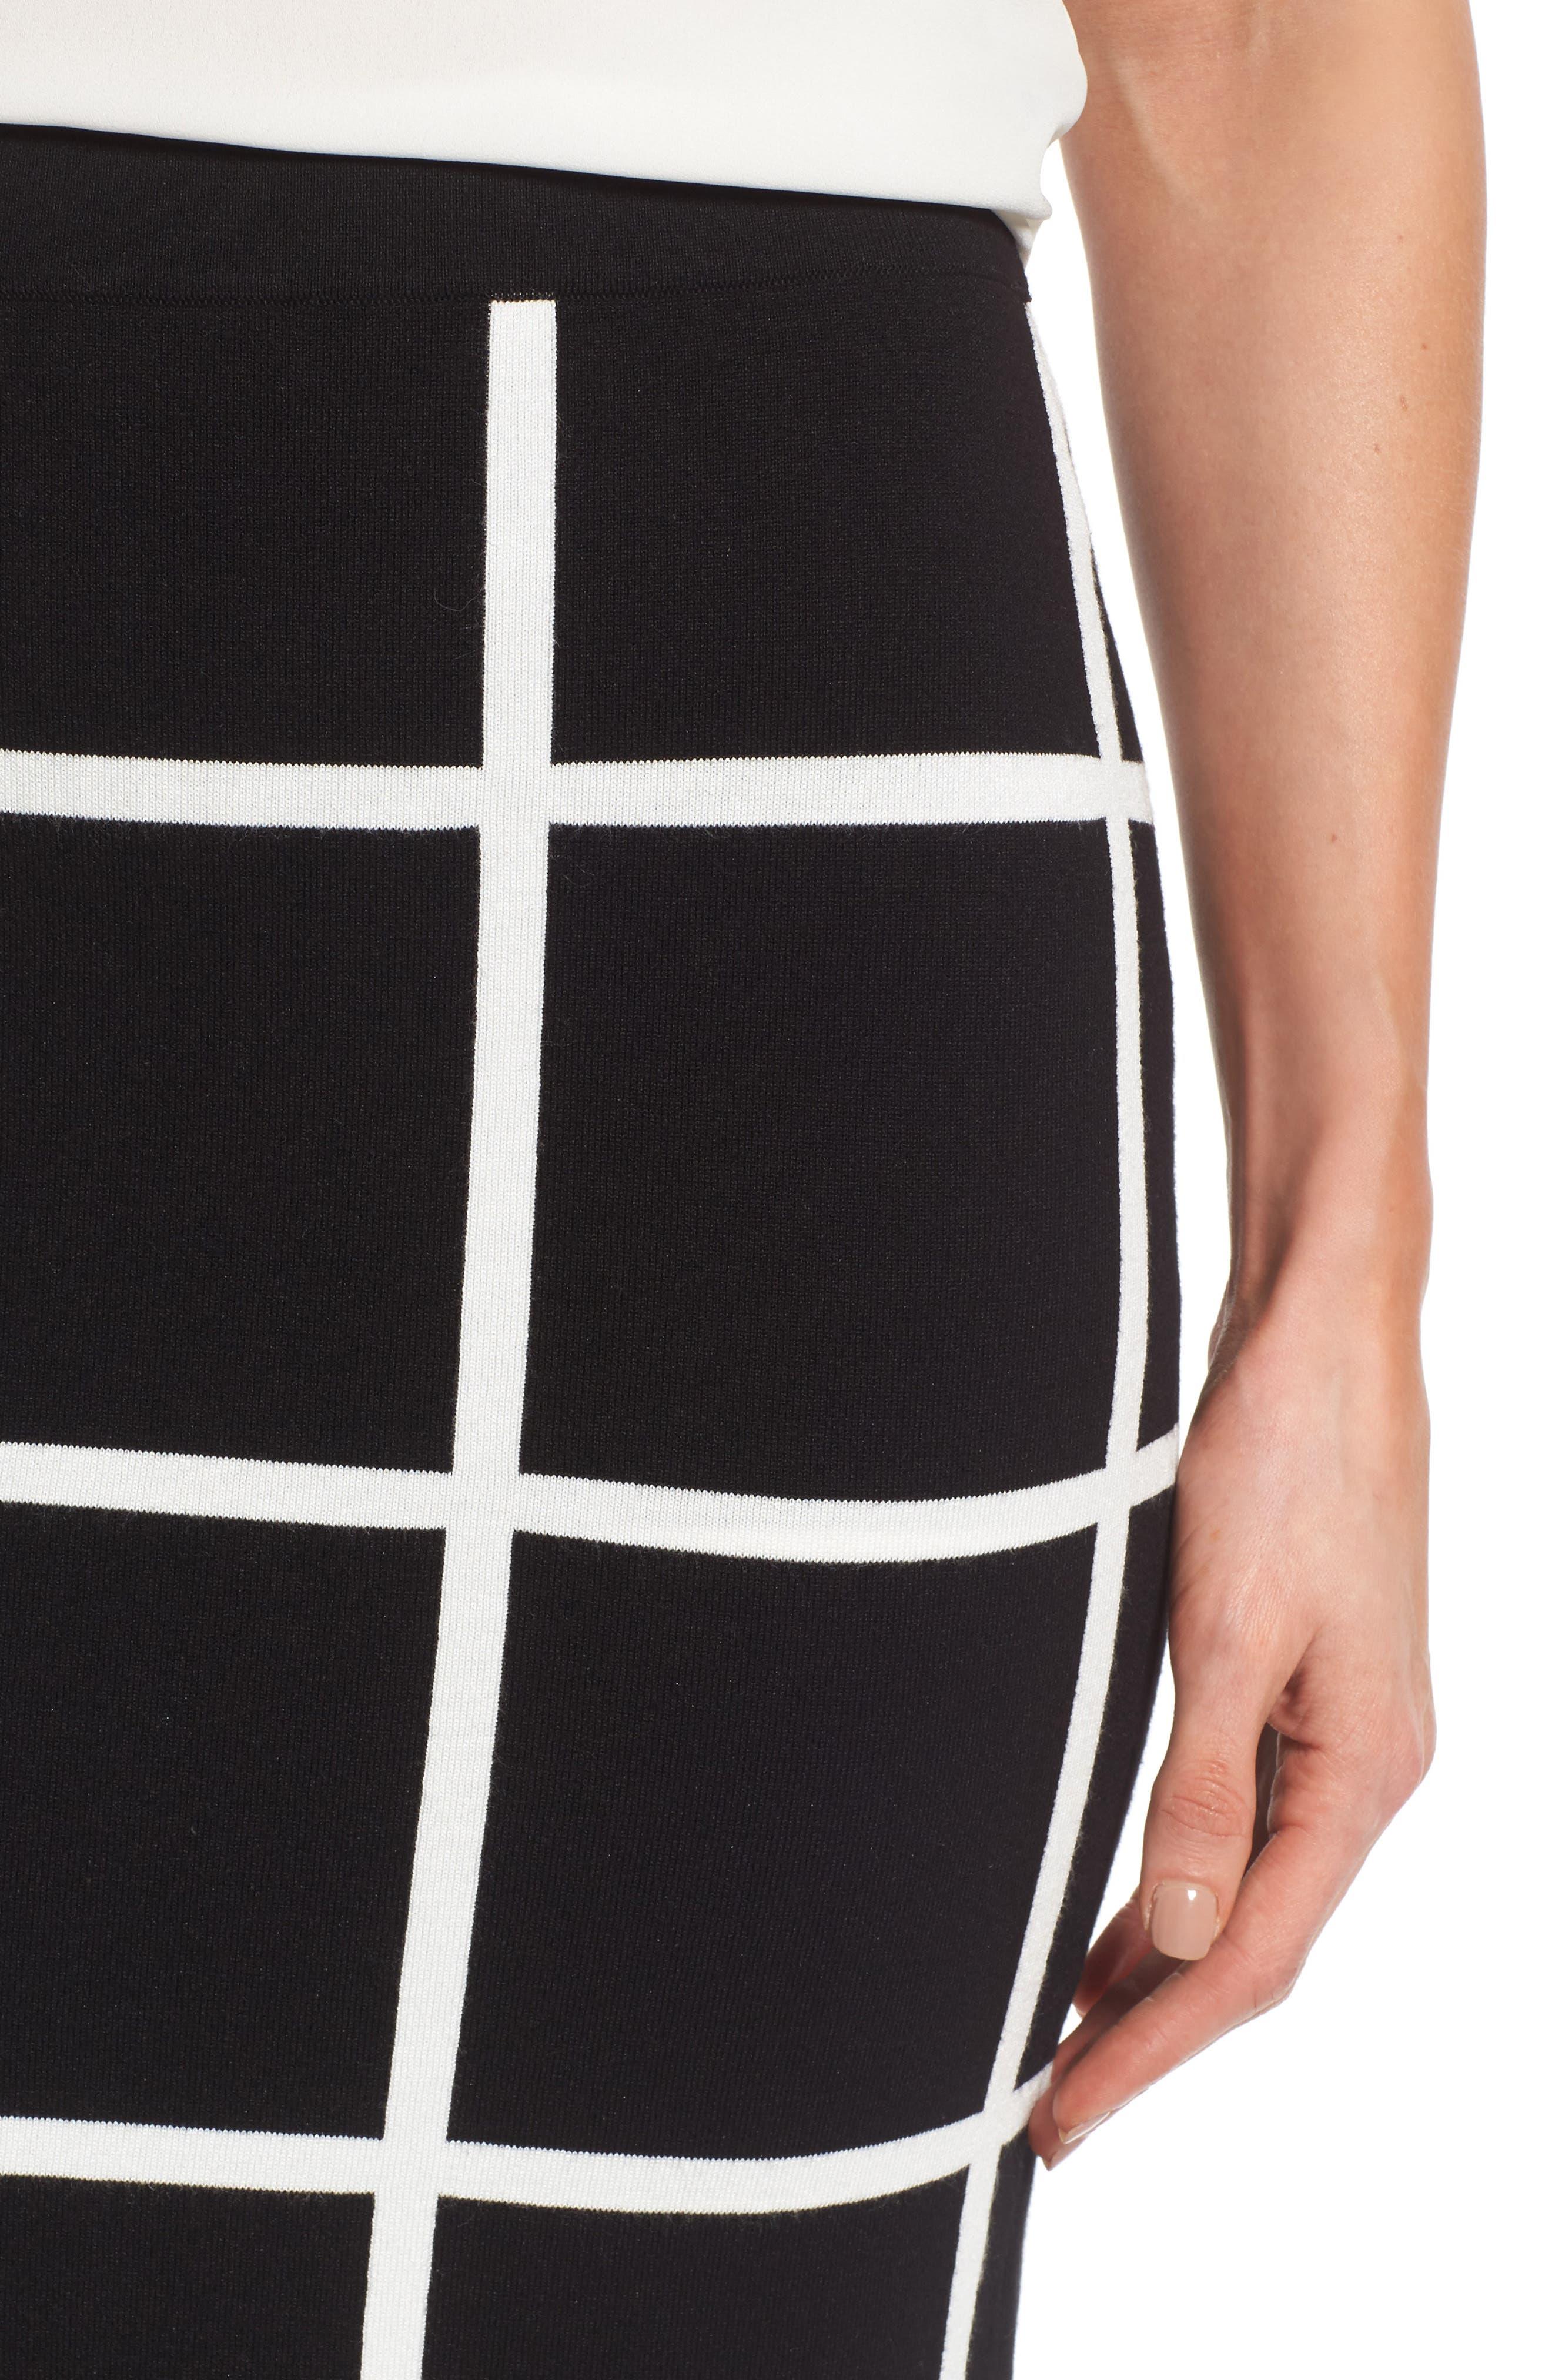 VINCE CAMUTO, Windowpane Sweater Knit Skirt, Alternate thumbnail 4, color, 006